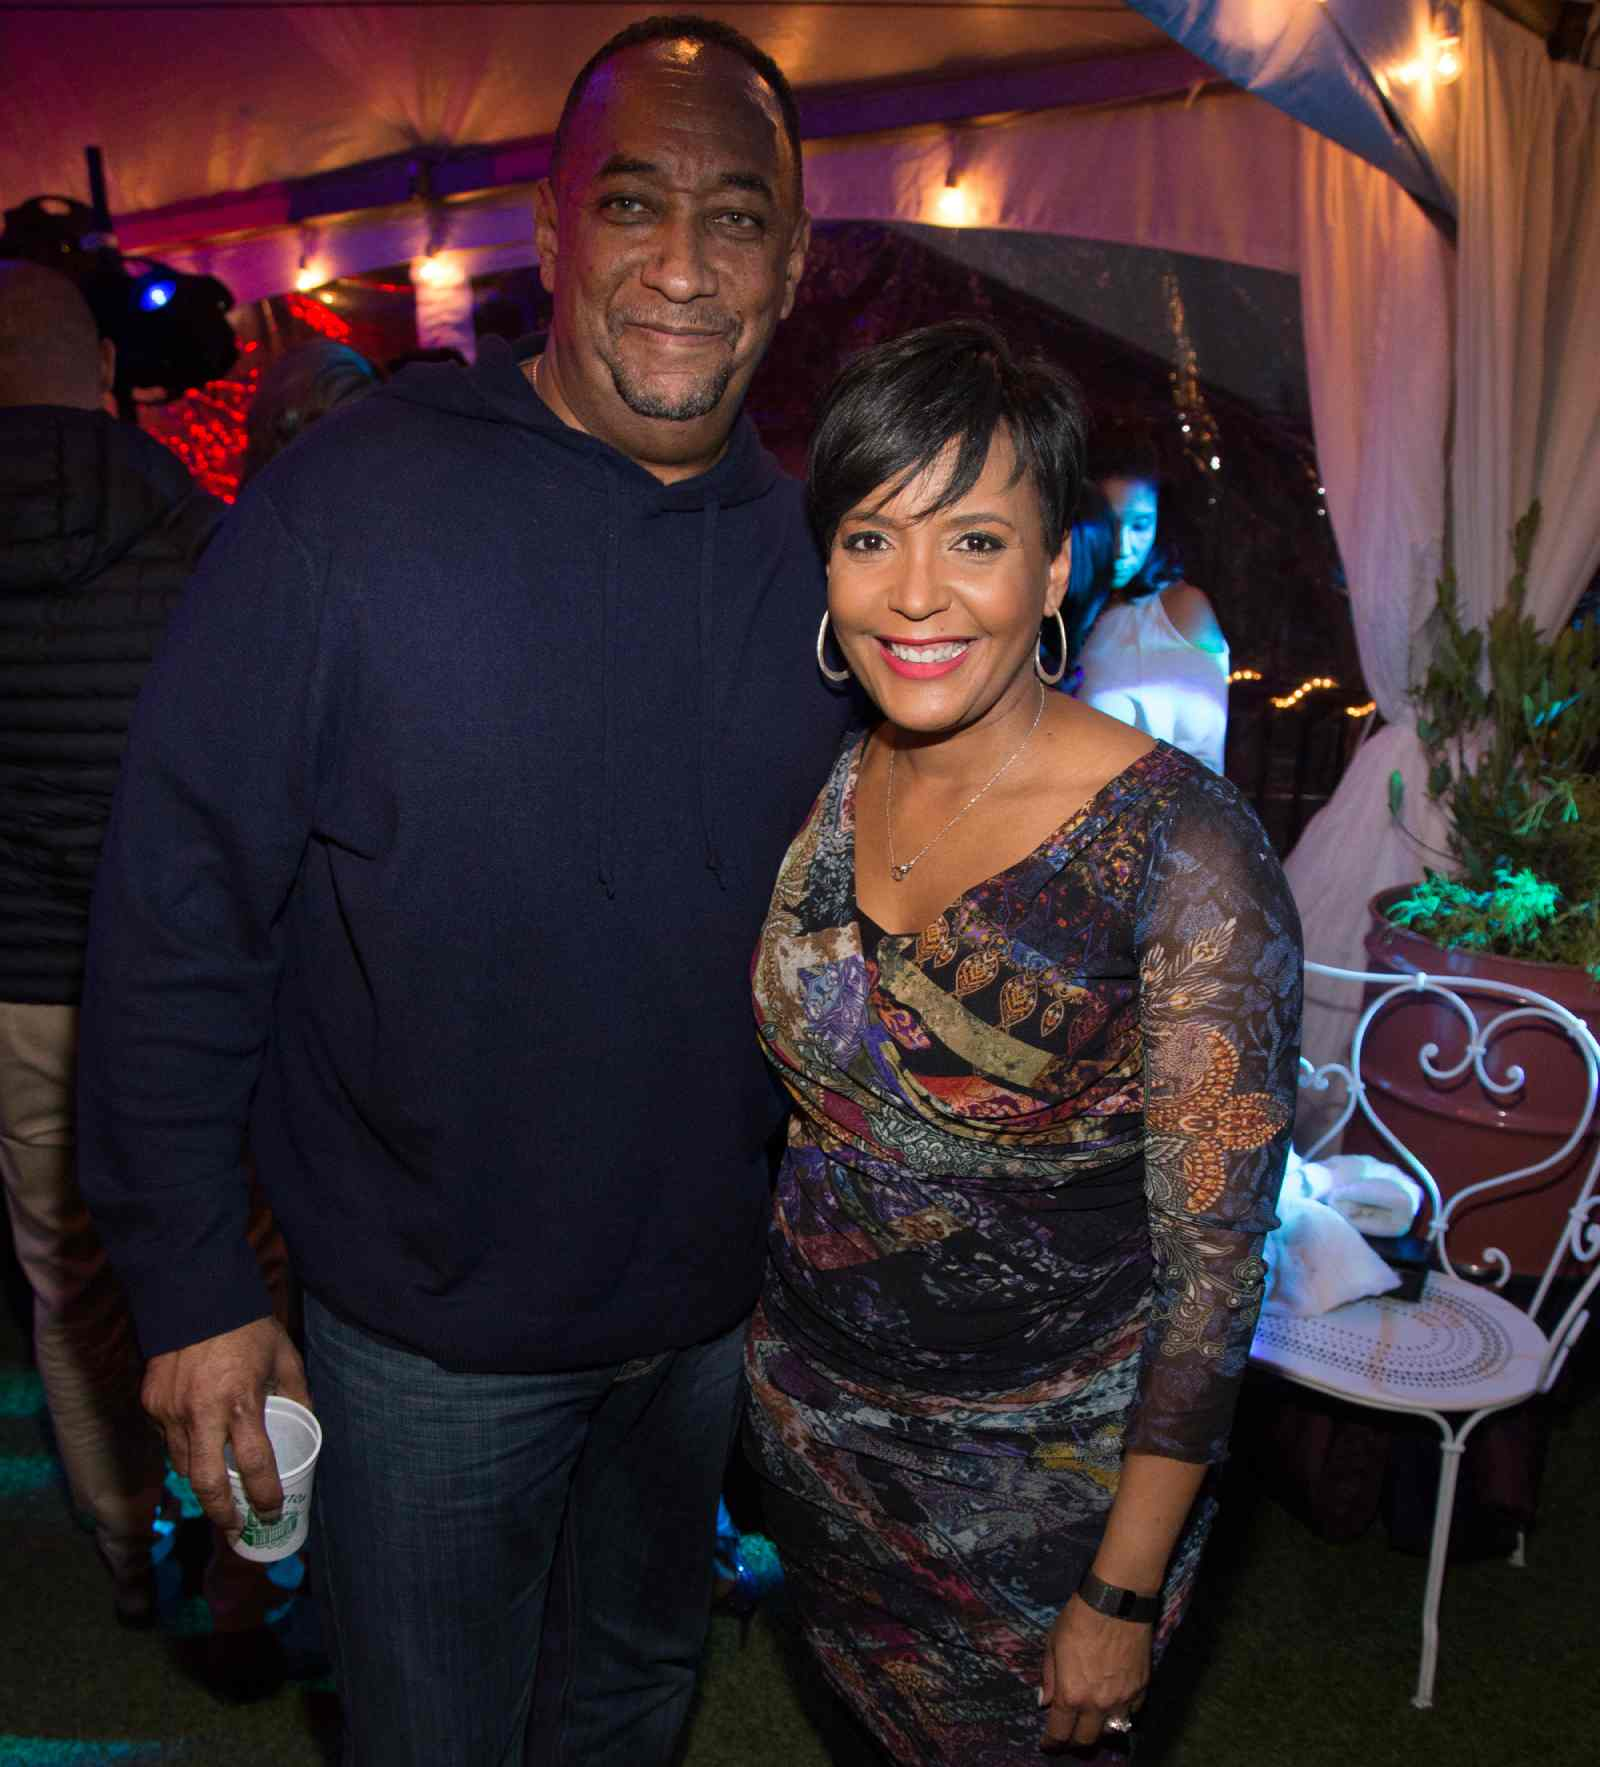 Derek Bottoms and her Mayor Wife Keisha Lance Bottoms